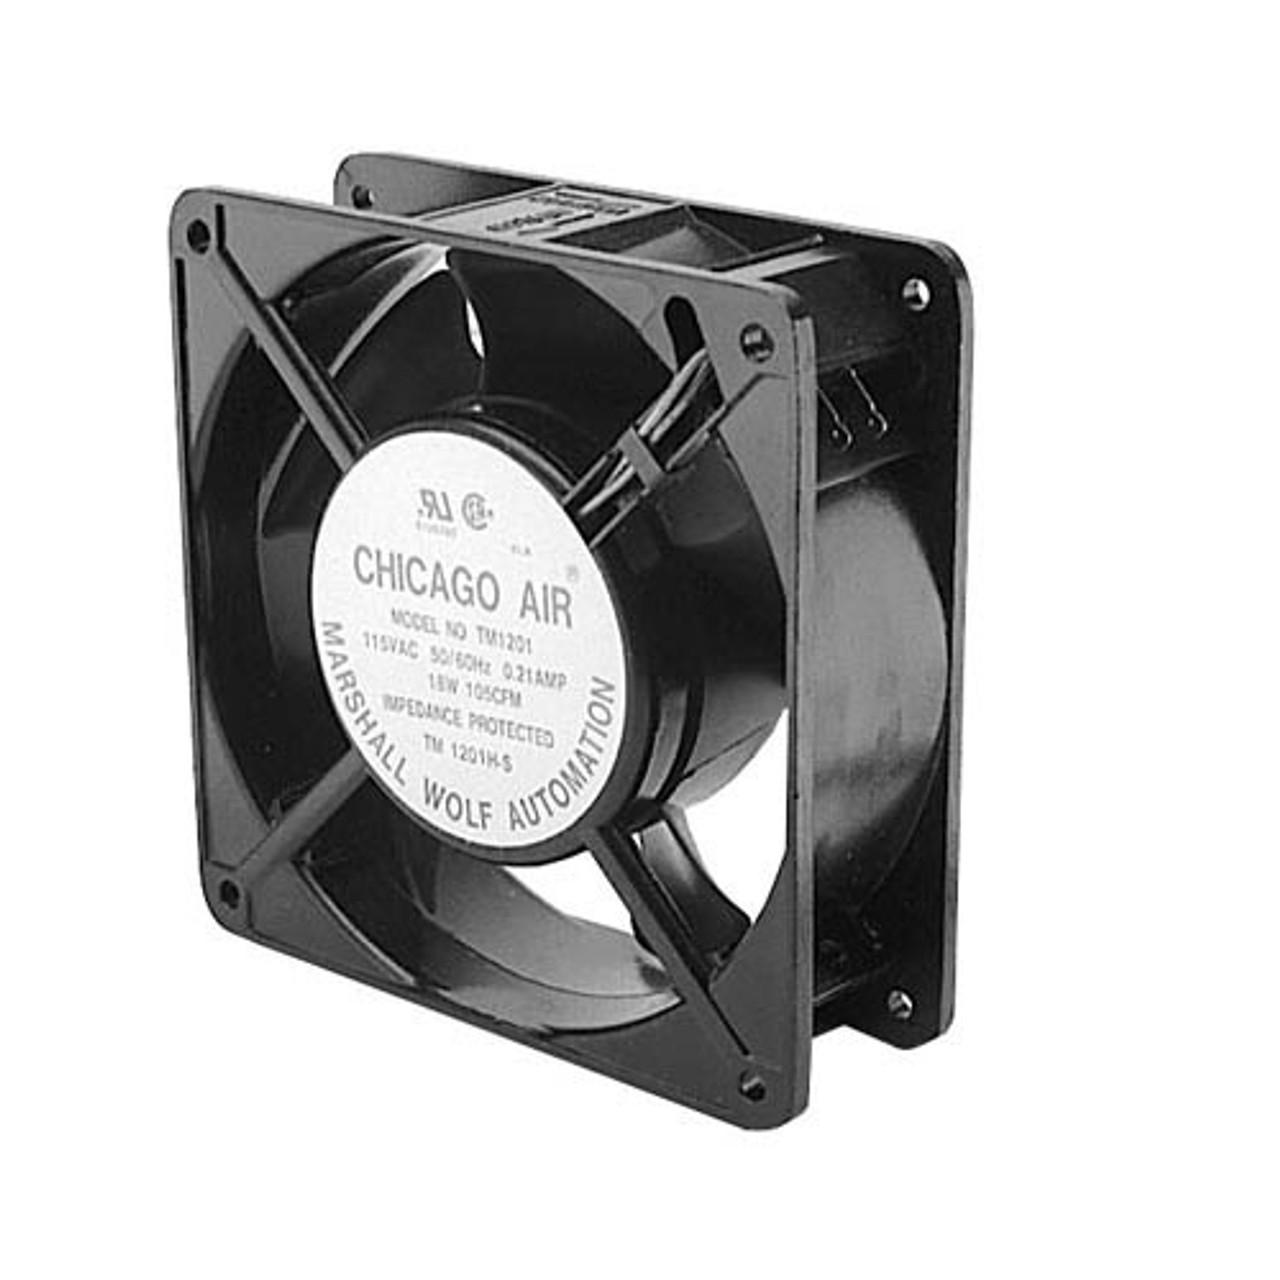 681159 - Middleby Marshall - Cooling Fan - 230v - 97525